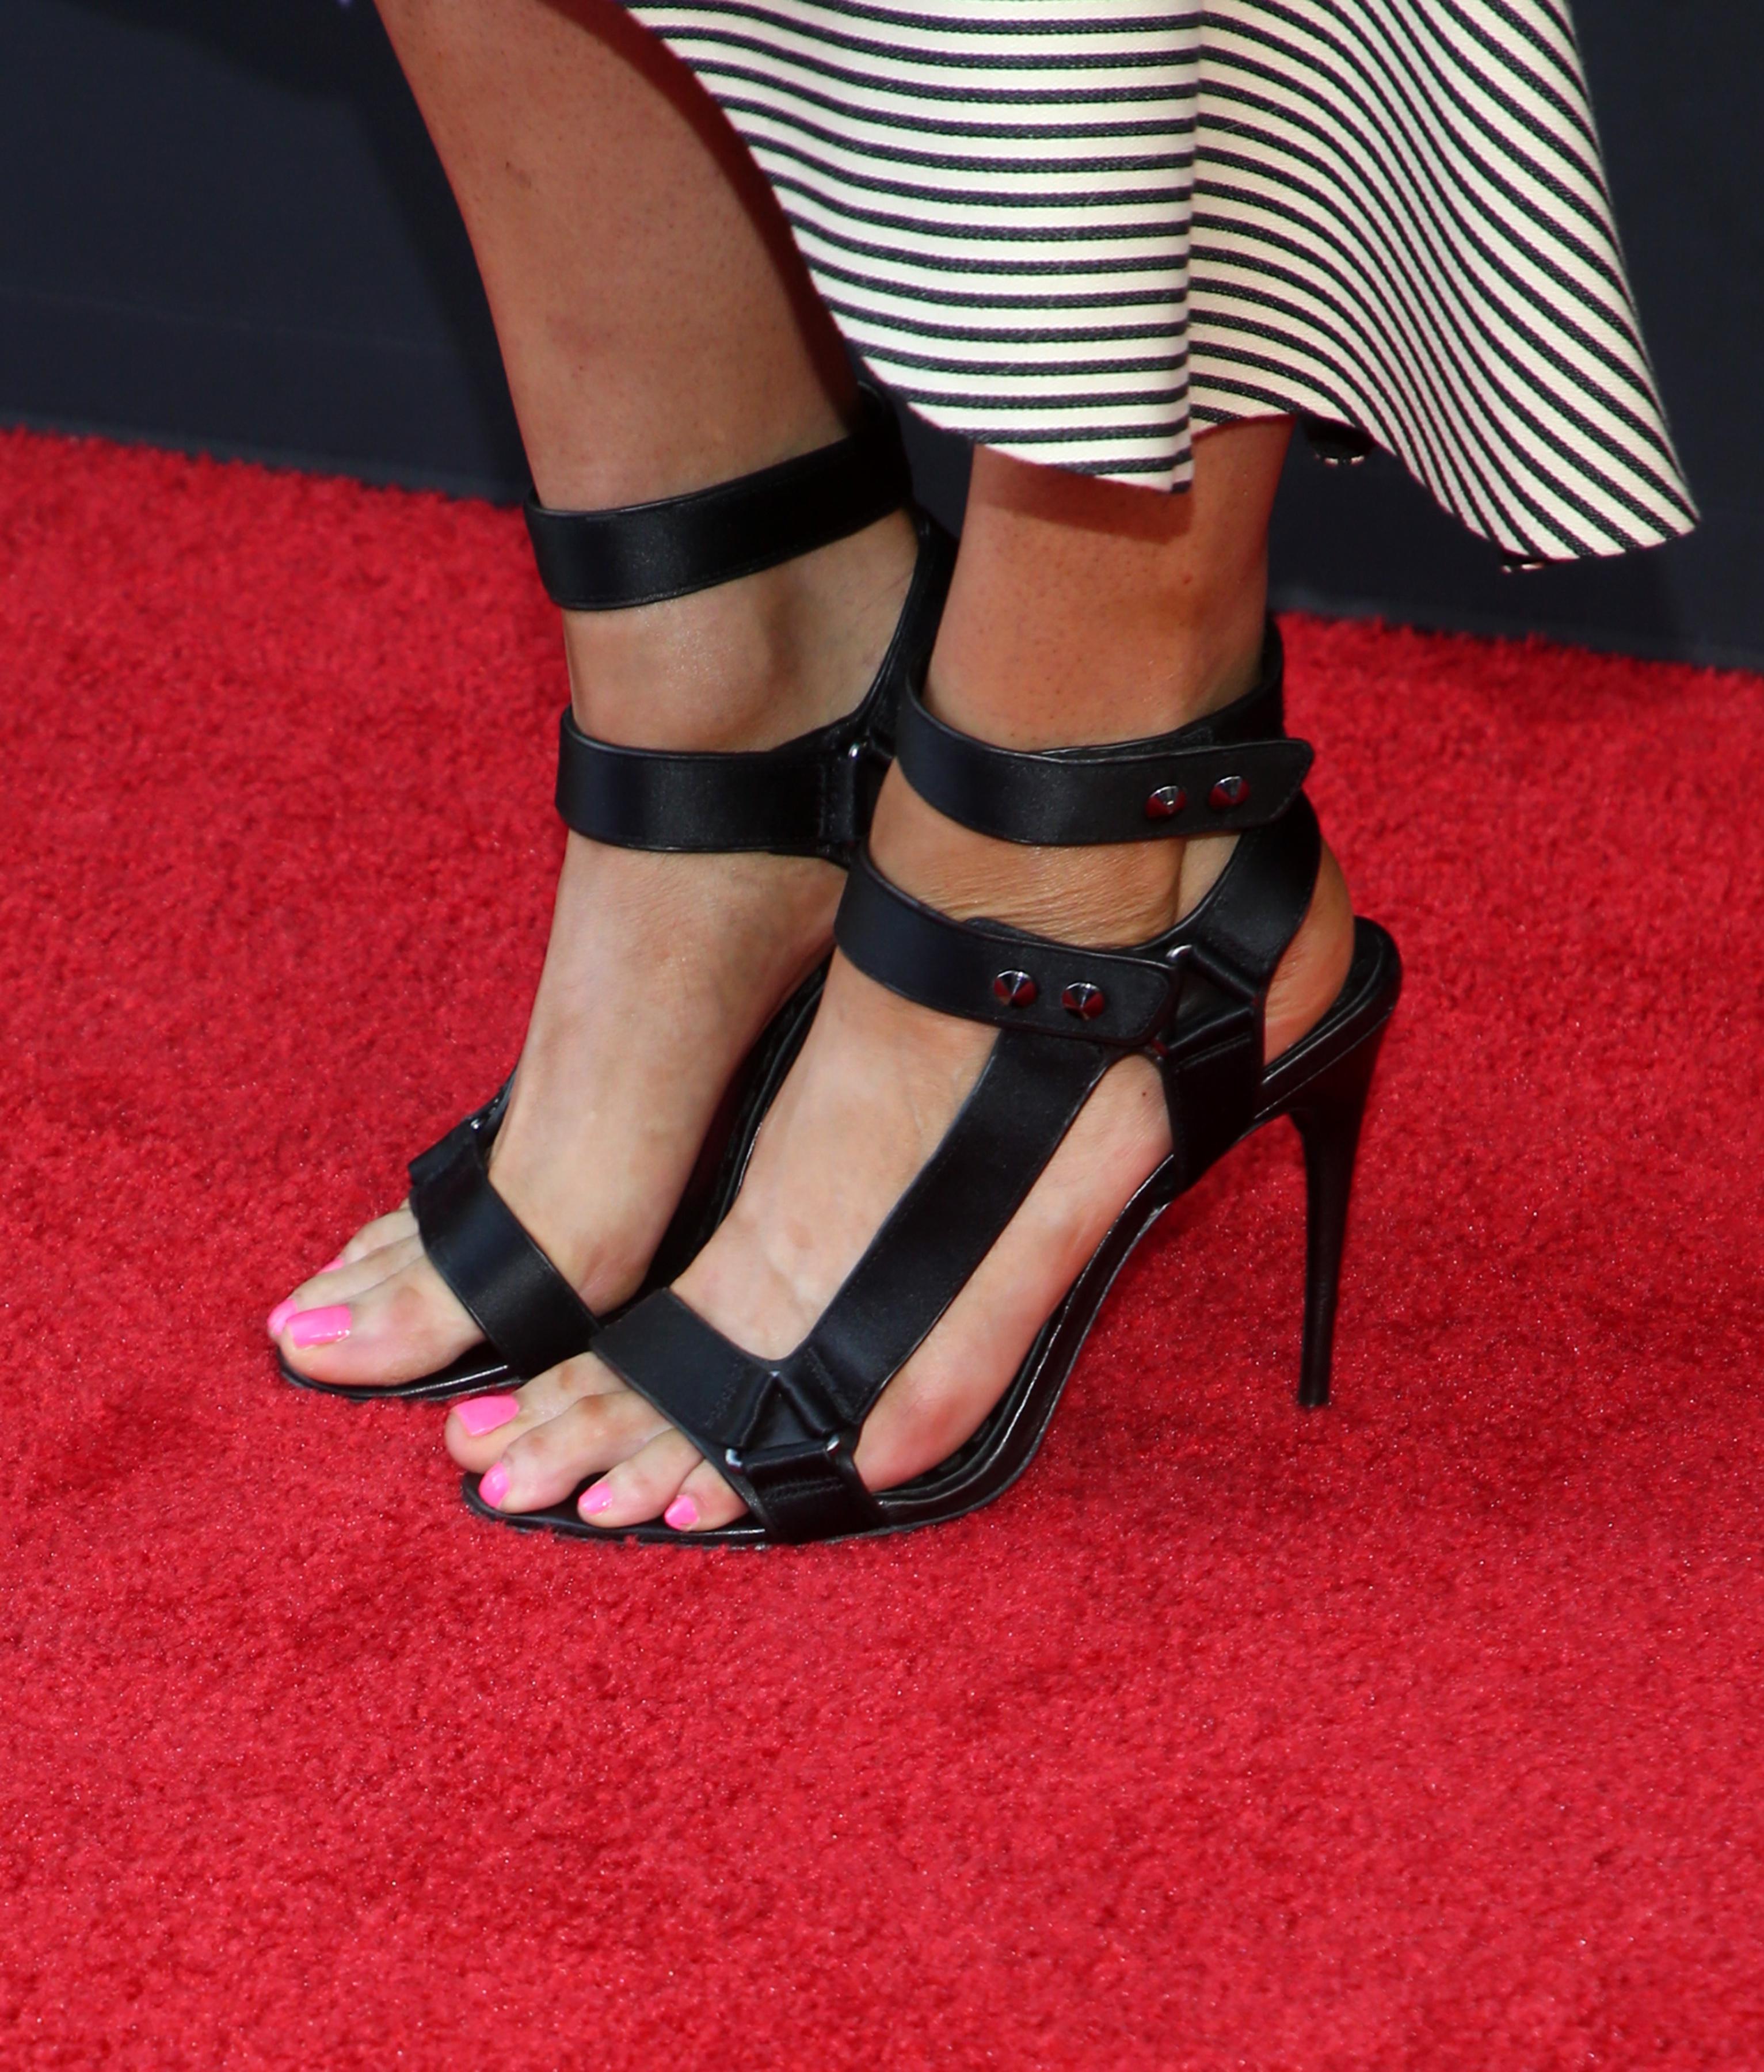 Ashley Fliehrs Feet